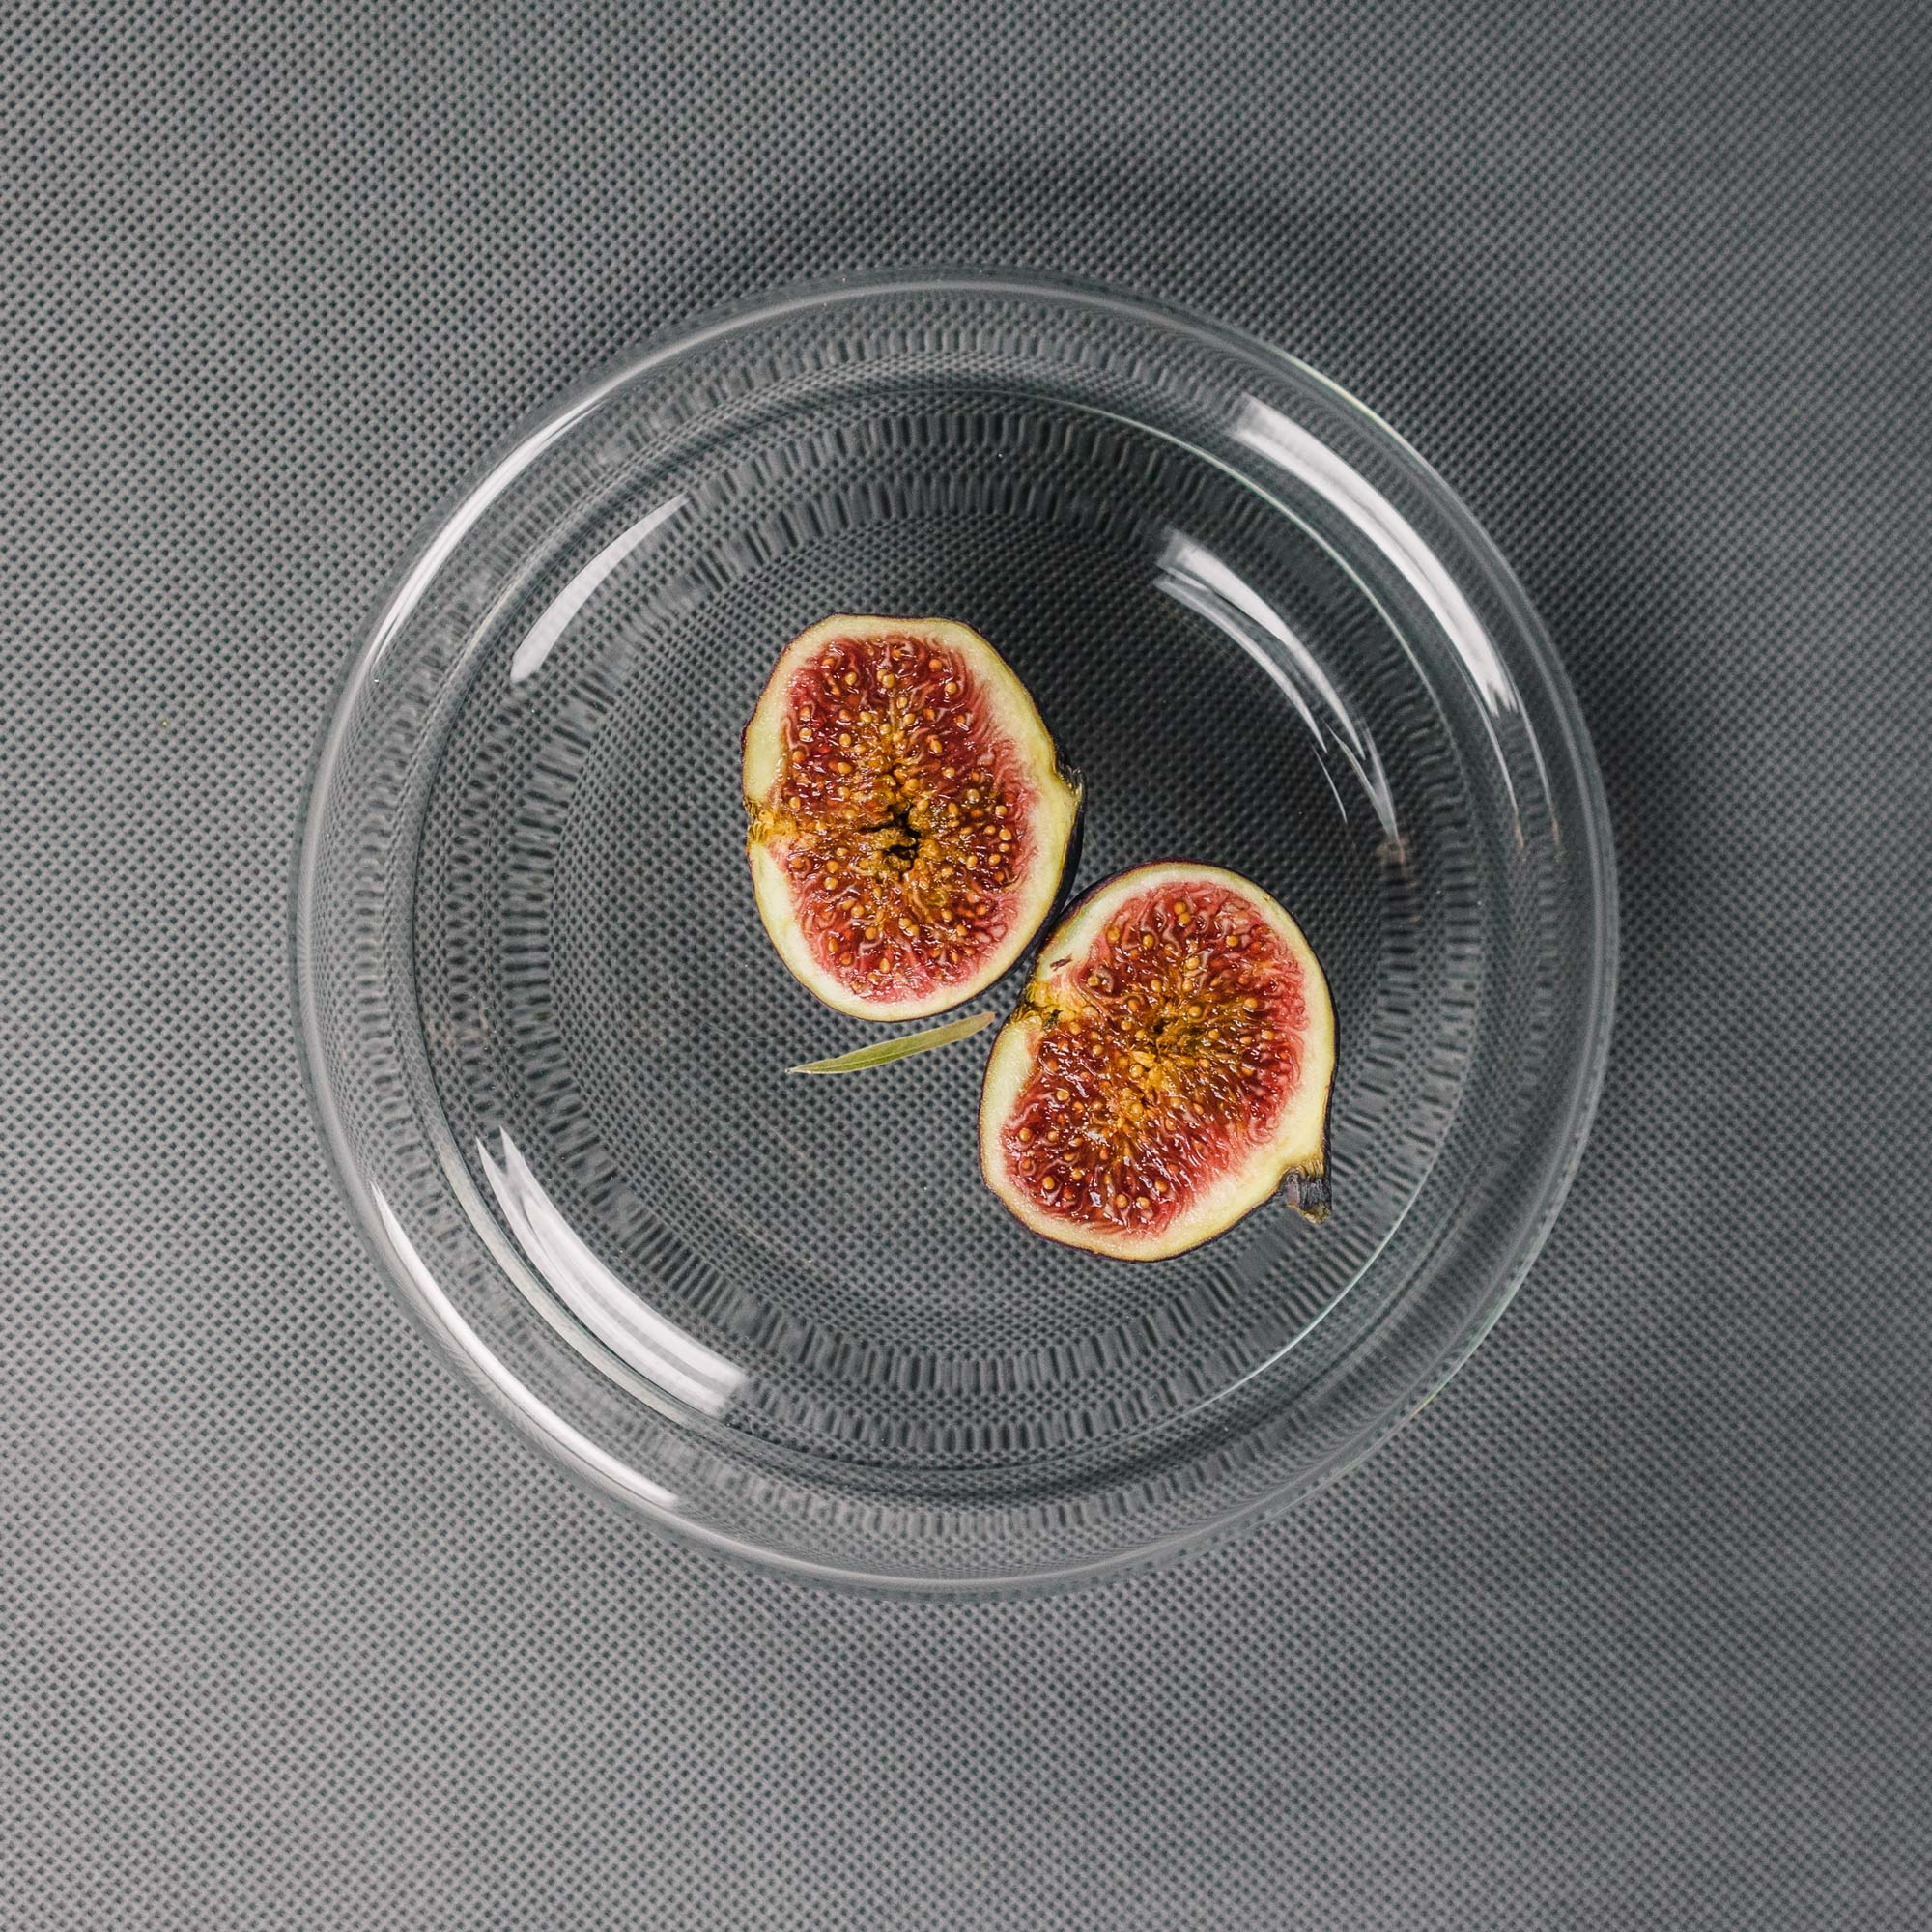 Small clear glass bowl with figs by Czech designer Michal Prazsky